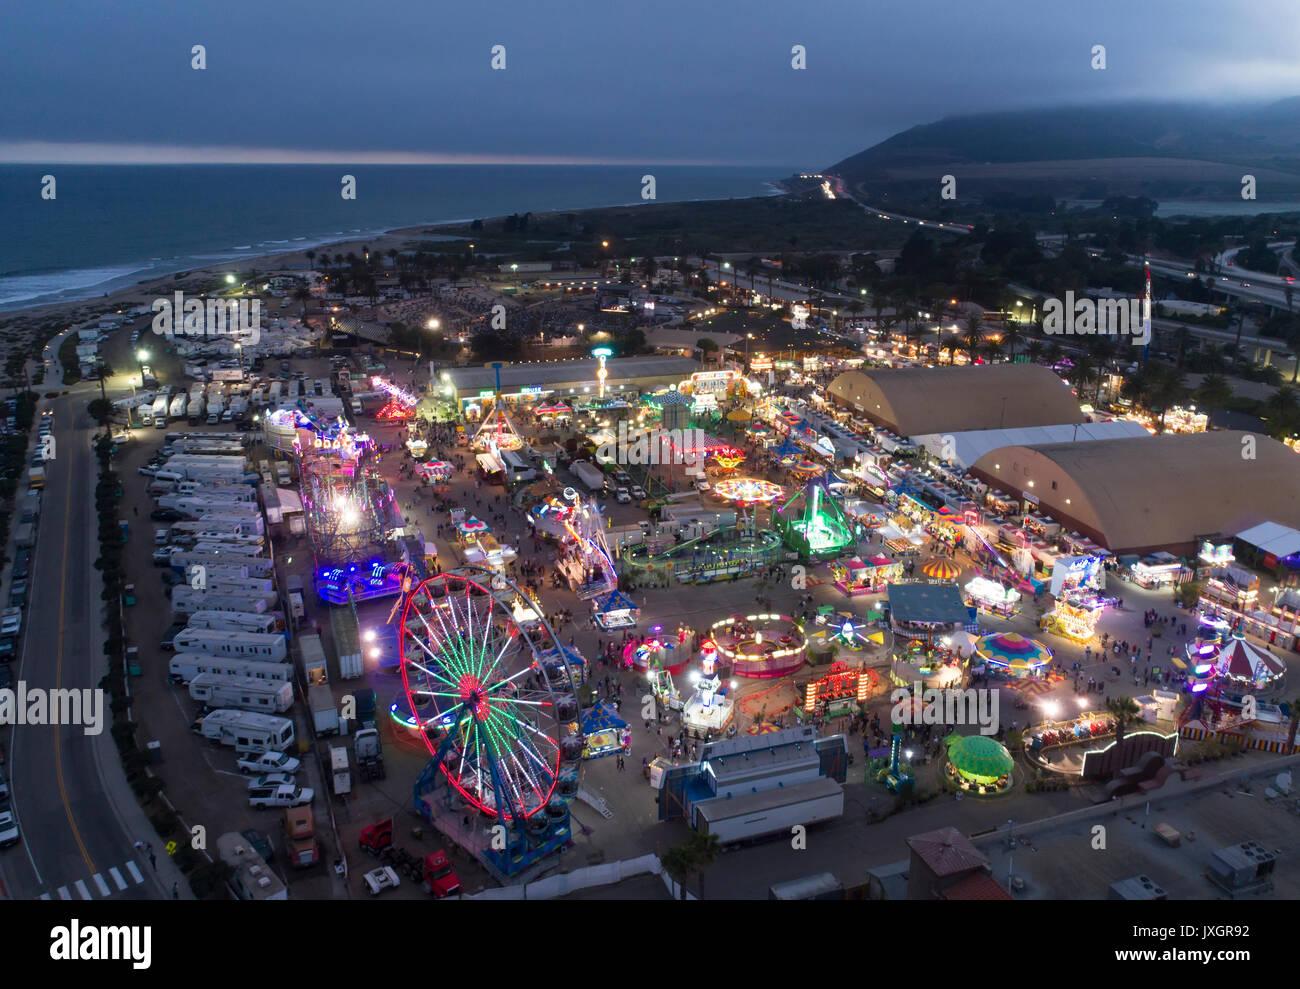 aerial view of the ventura county fair at night, ventura california